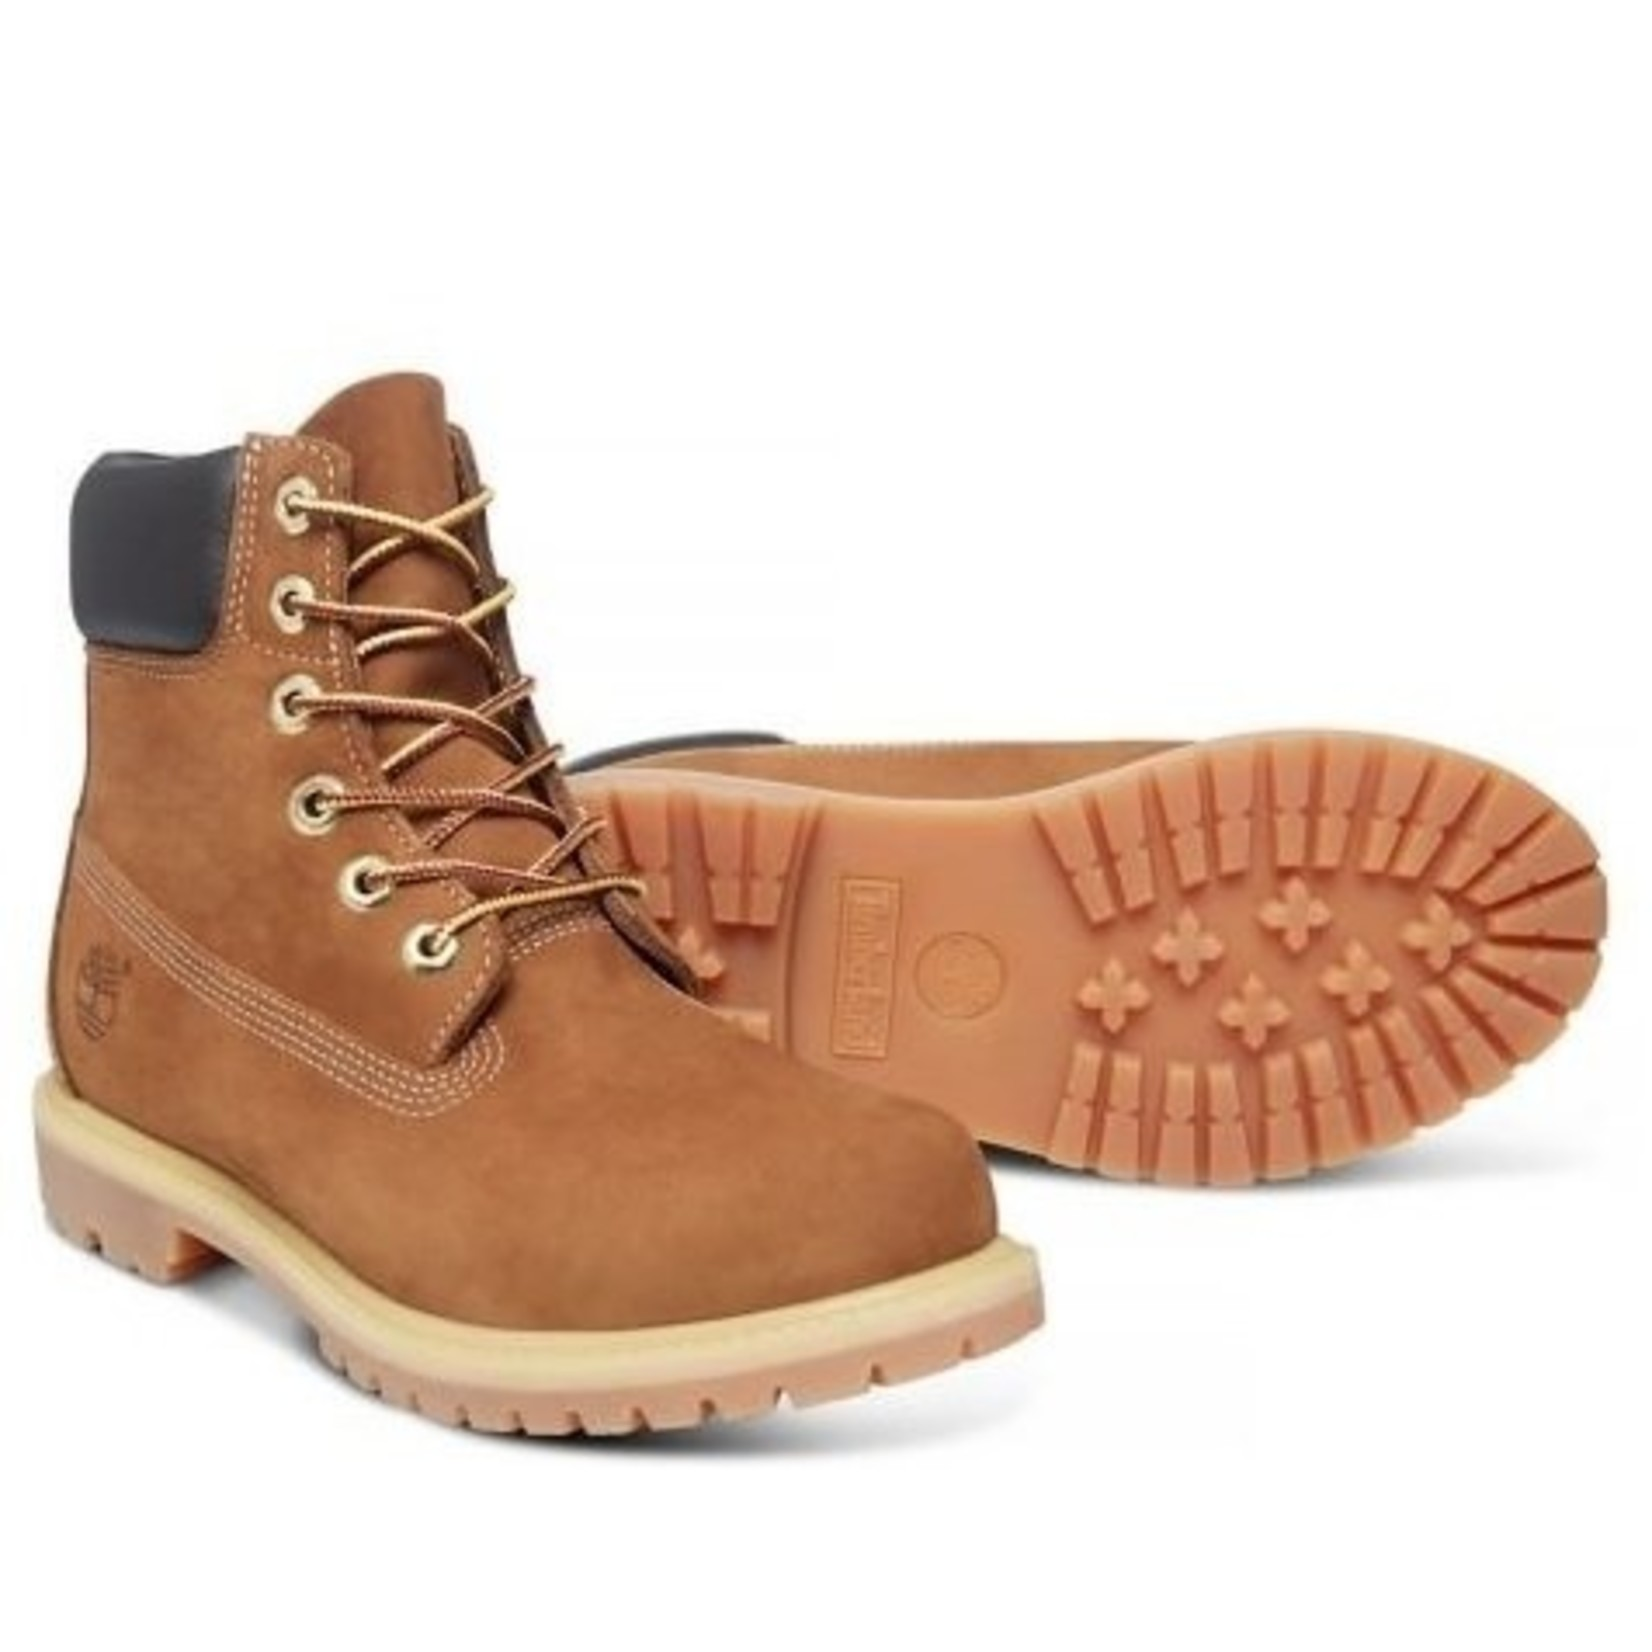 Timberland 6-Inch Premium Waterproof Boot Damen